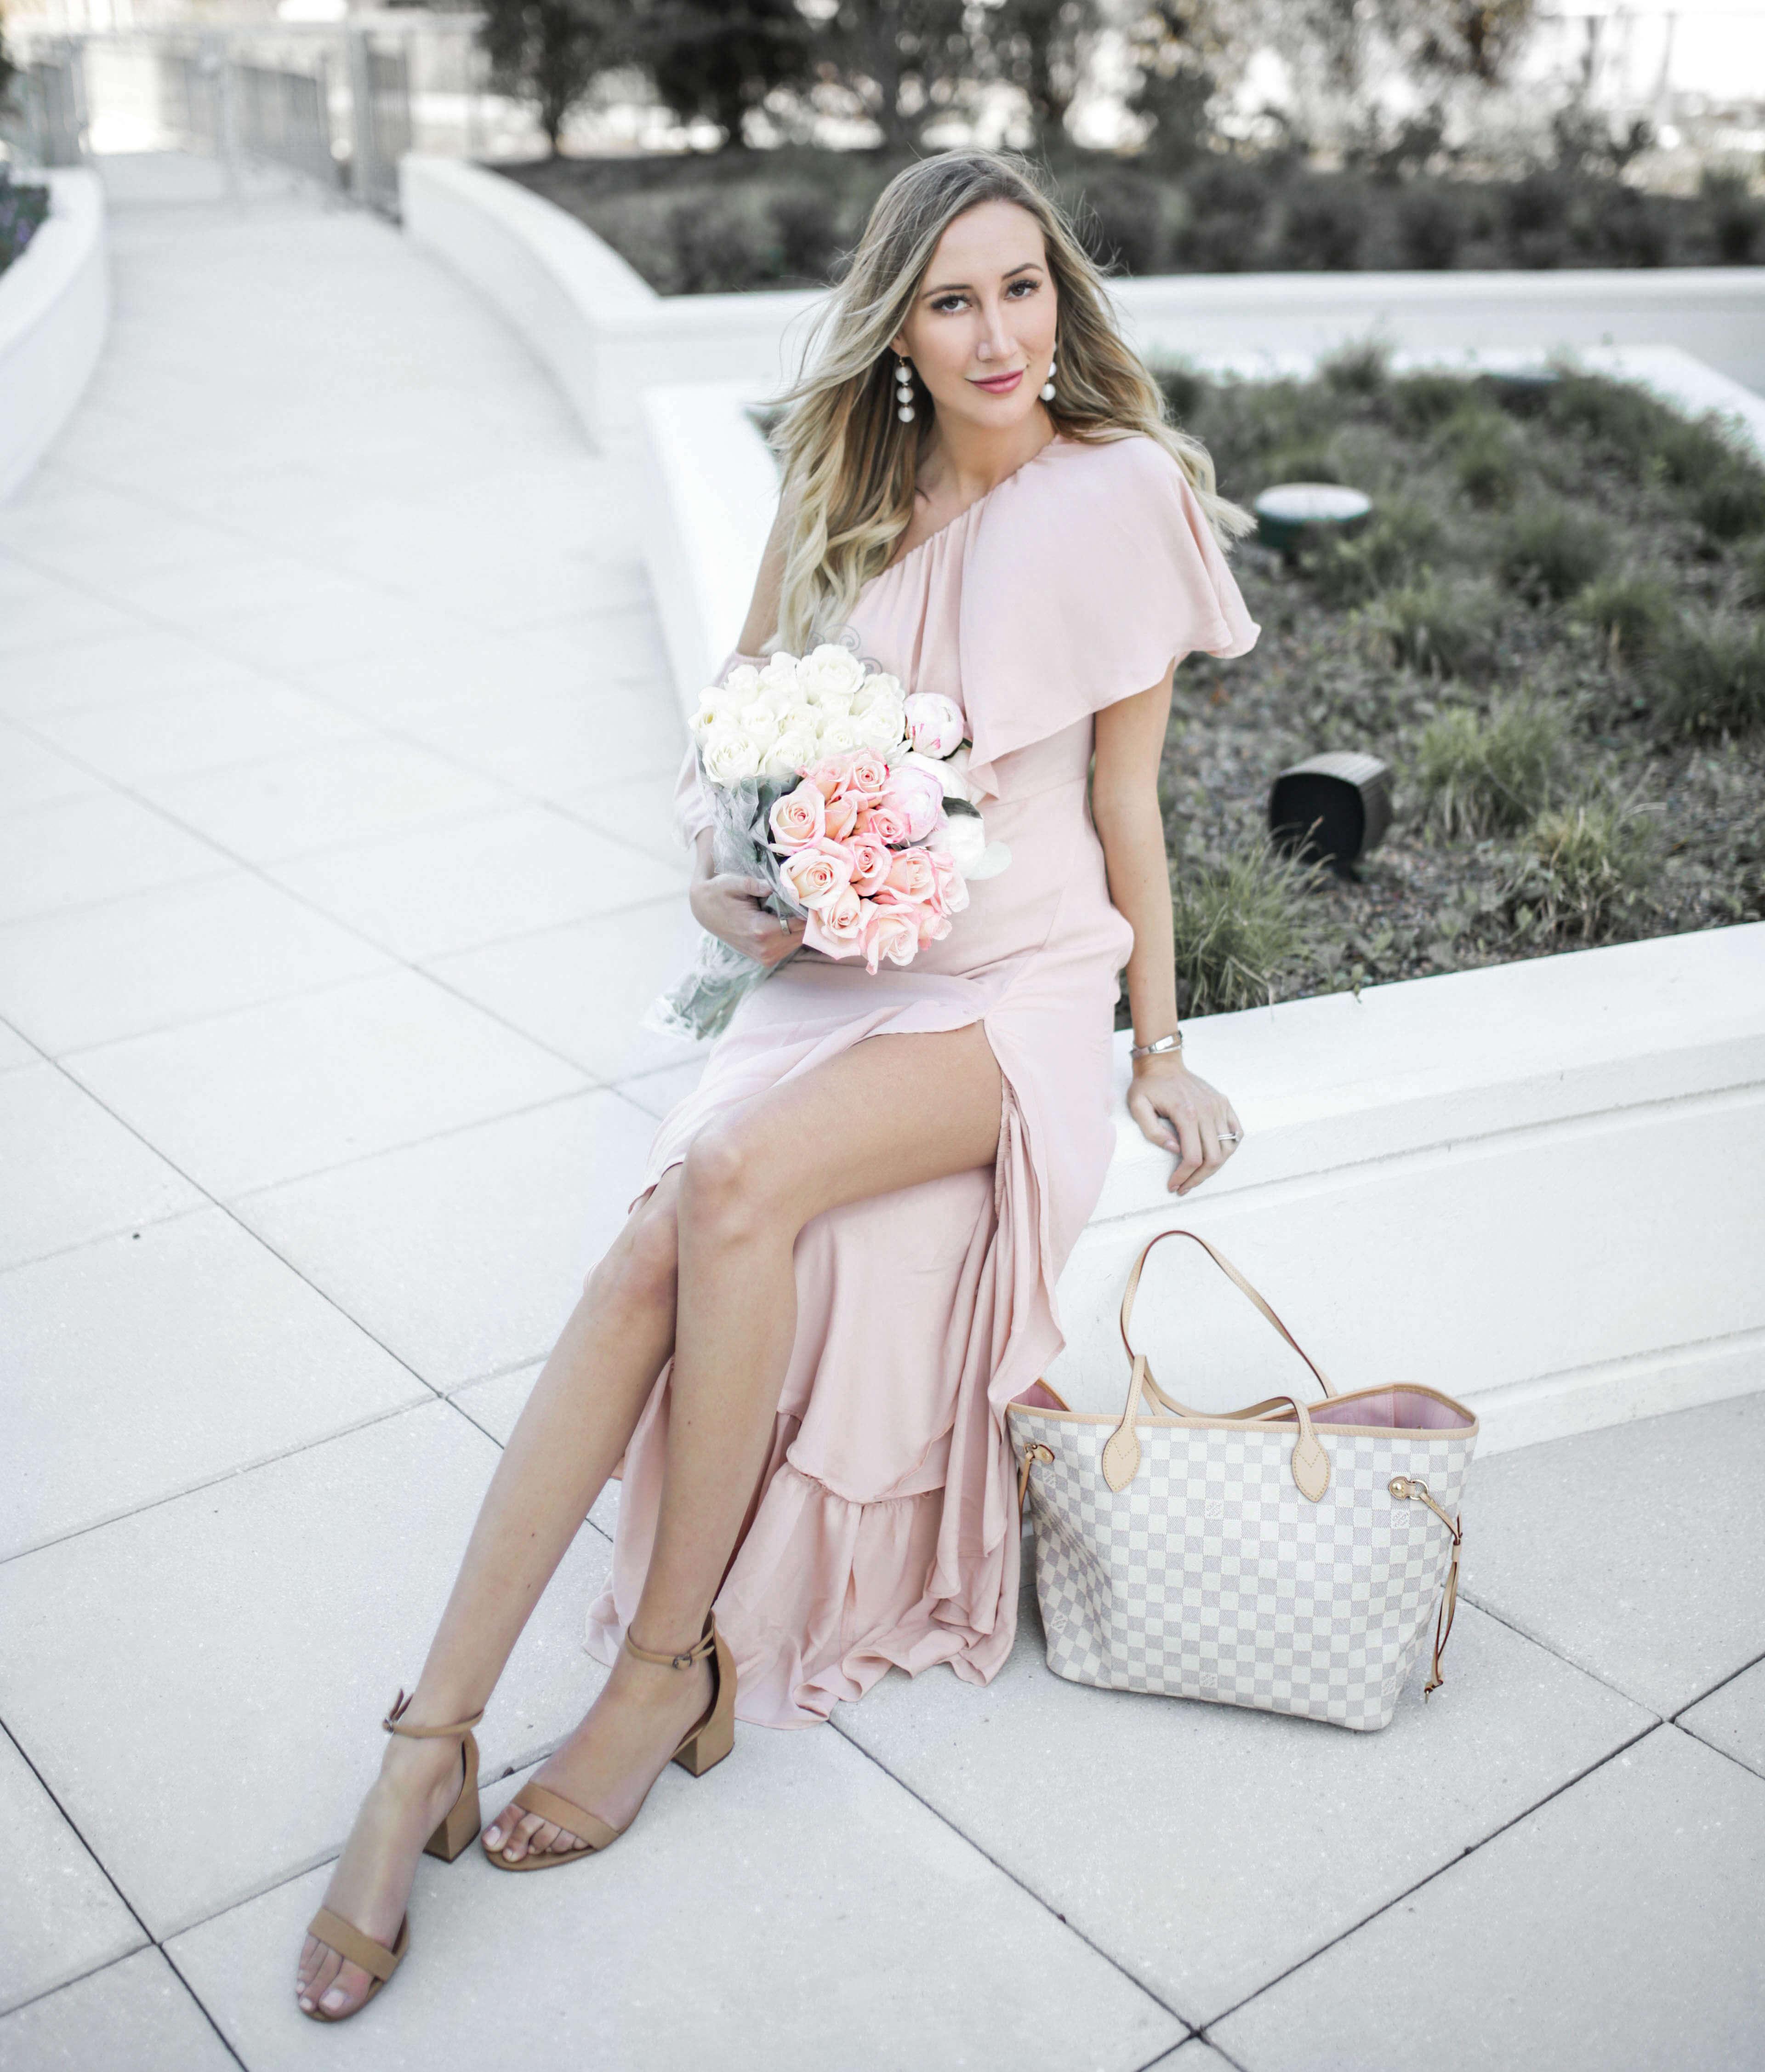 Carly Cristman wearing a Show Me Your Mumu blush ruffle gown, summer wedding guest gown, summer wedding outfit ideas, summer weddings